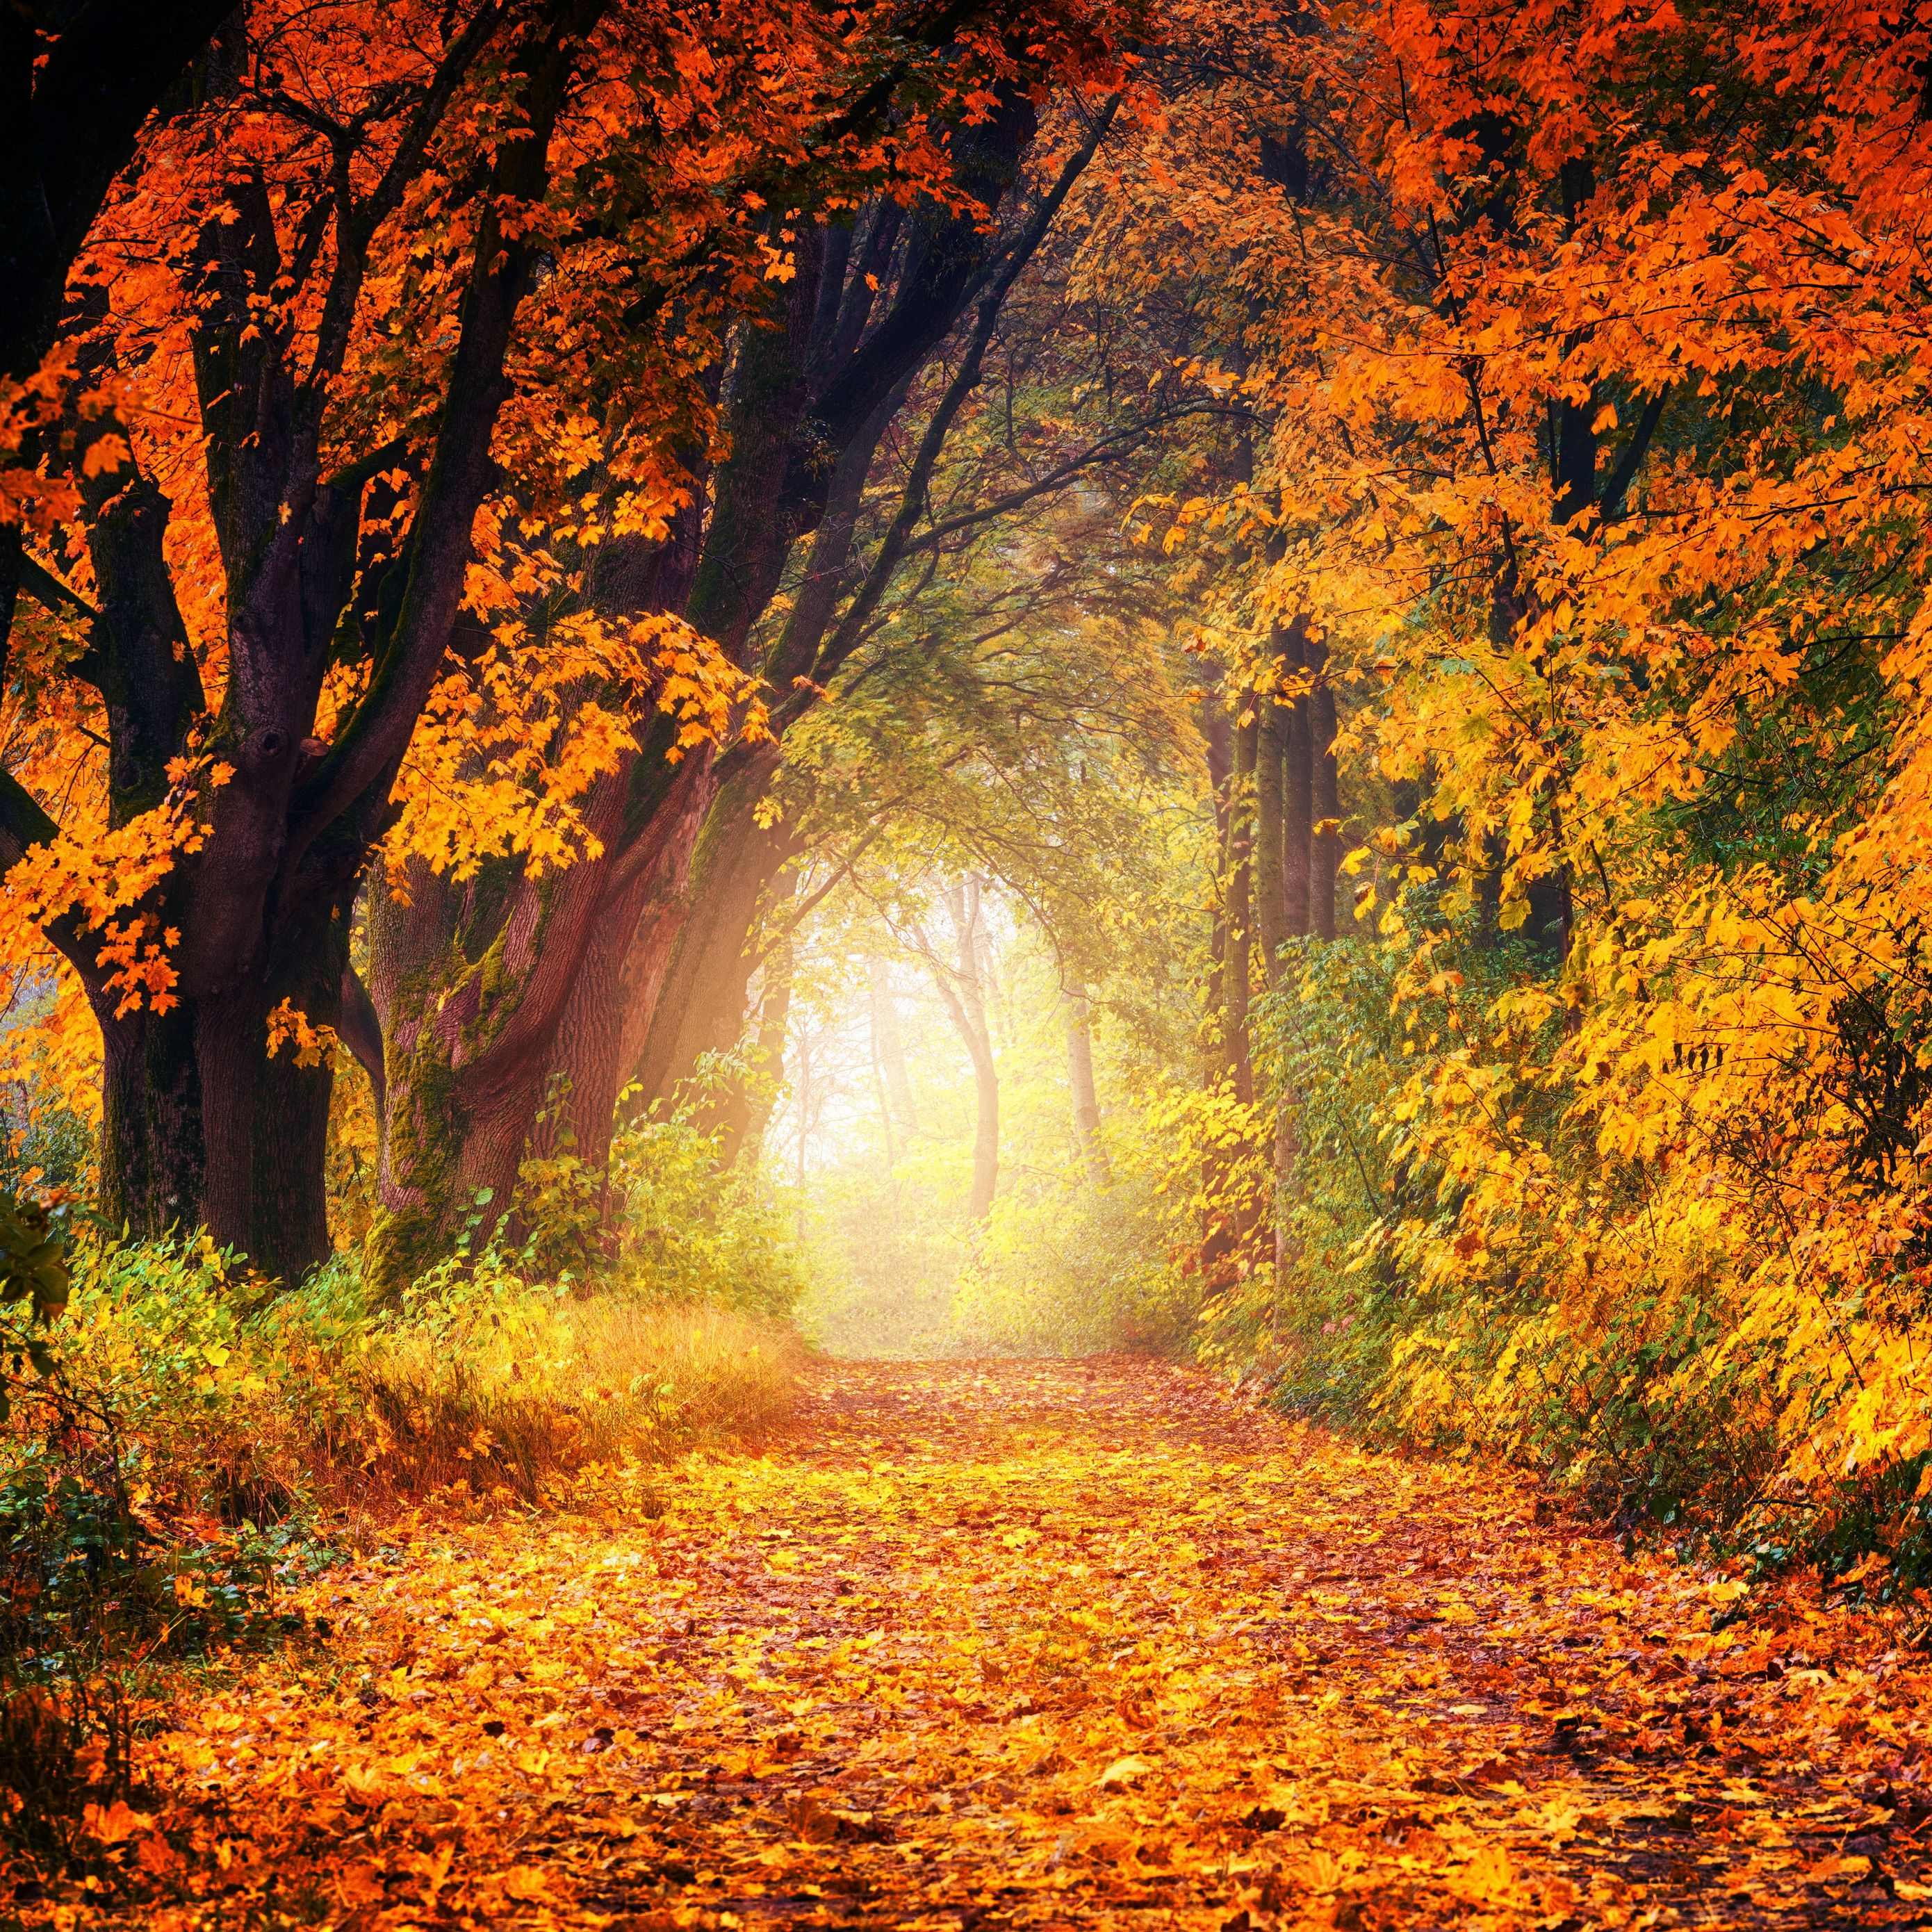 2780x2780 Wallpaper autumn, park, foliage, trees, path, light, golden